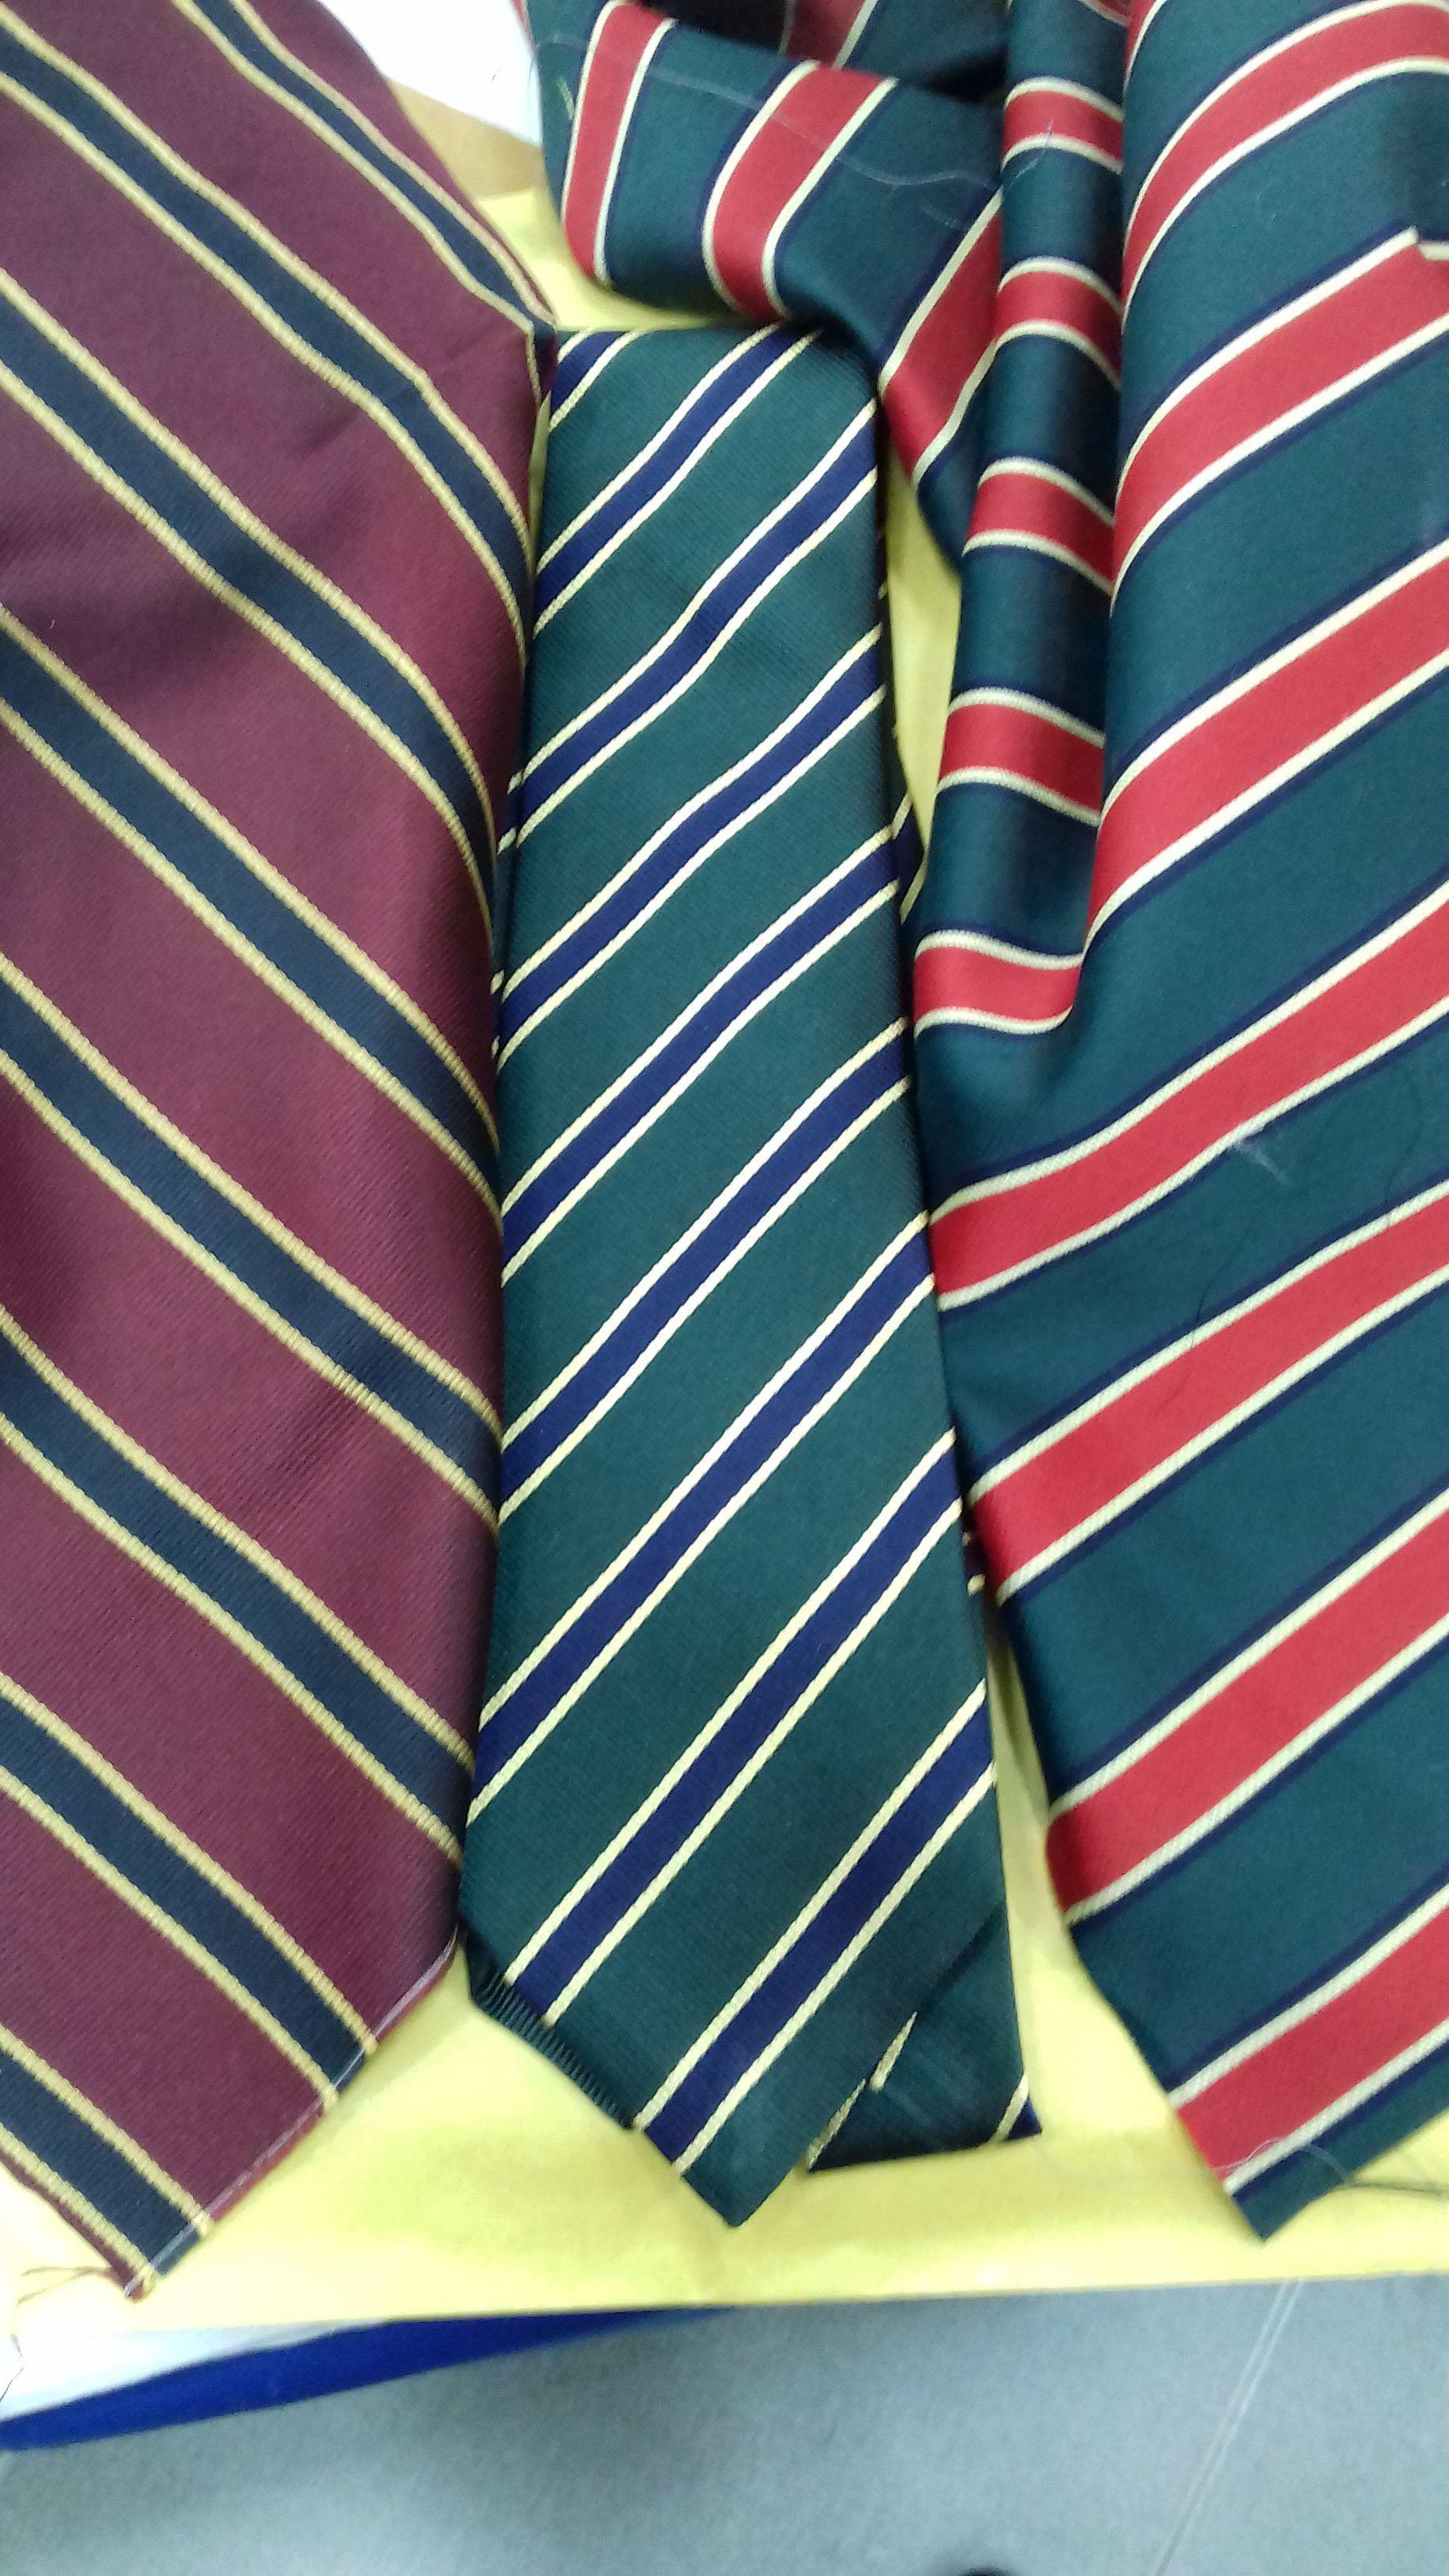 Three-color striped ties